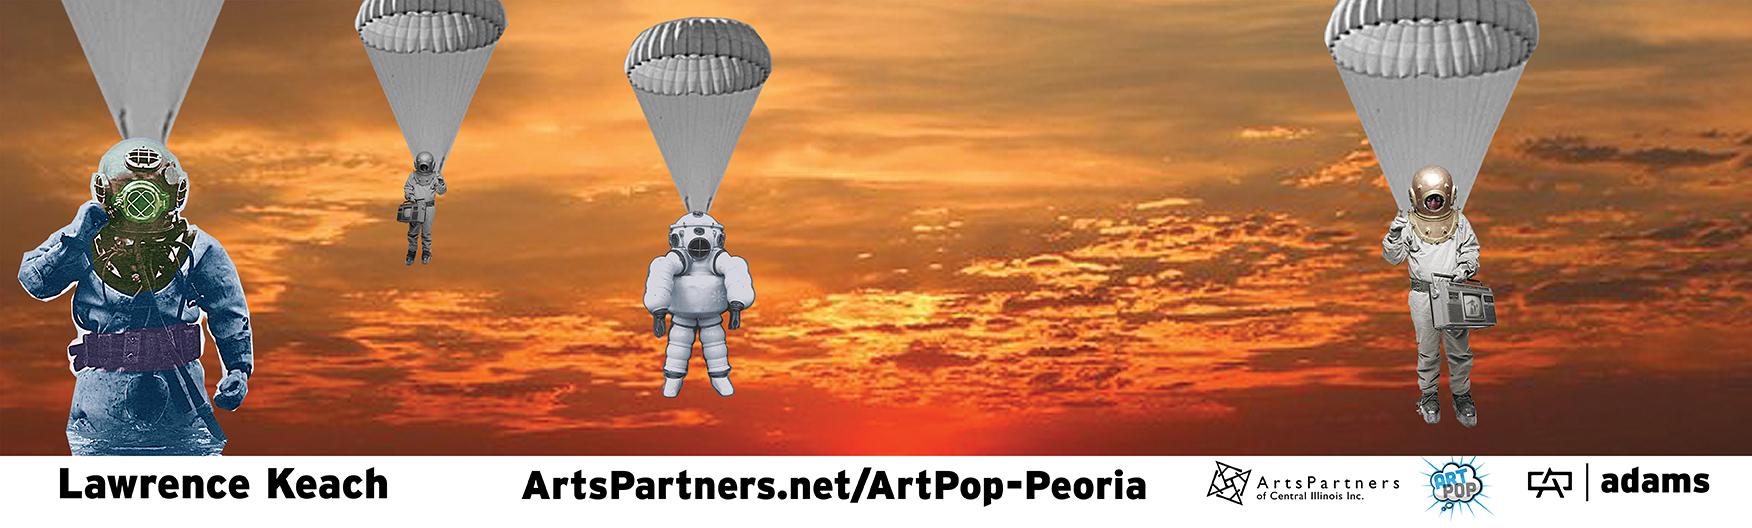 ArtsPartners_ART POP_14x48_Keach.jpeg